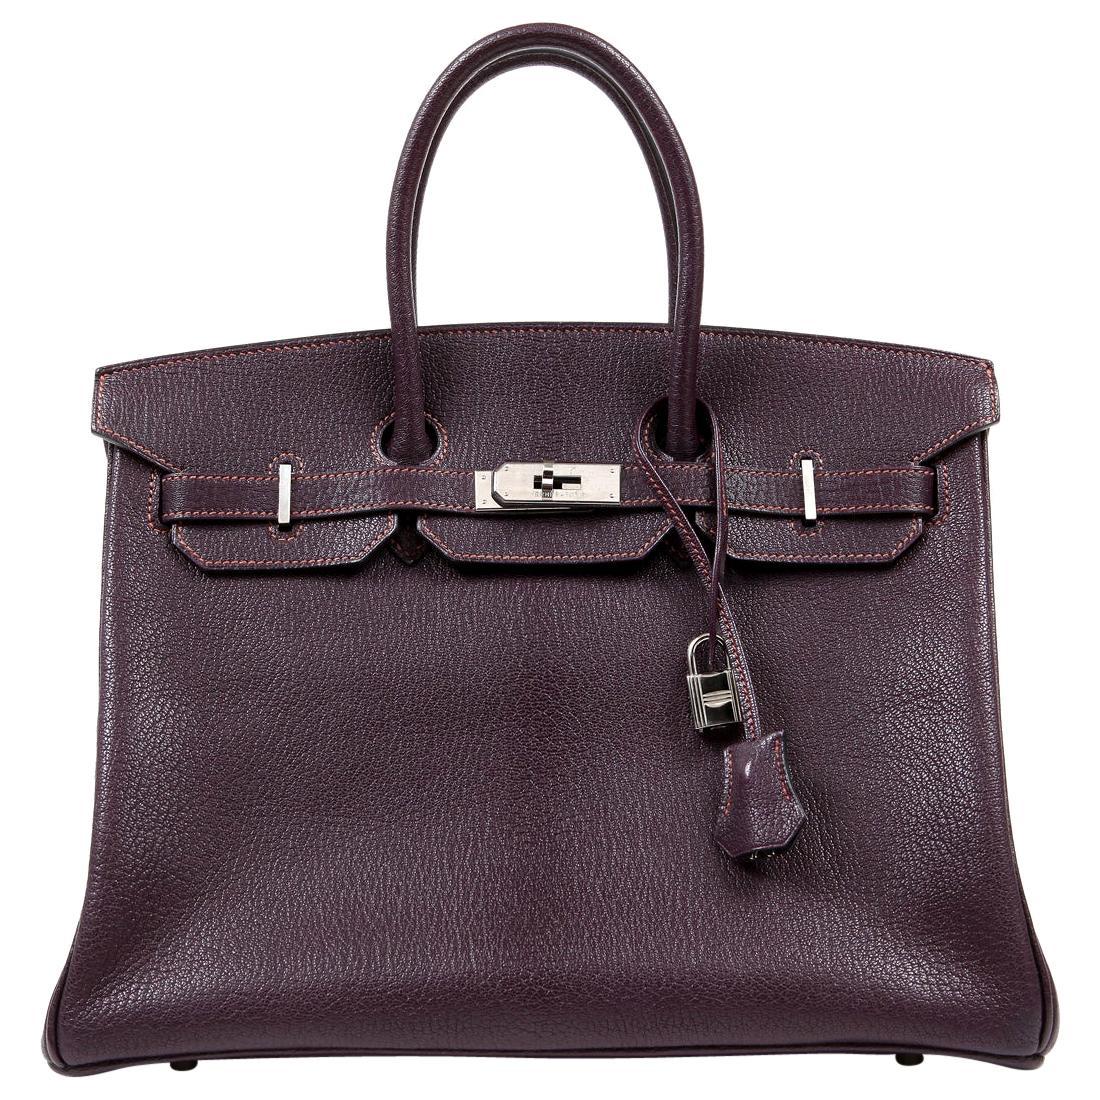 Hermès Raisin Chevre Leather 35 cm Birkin Bag